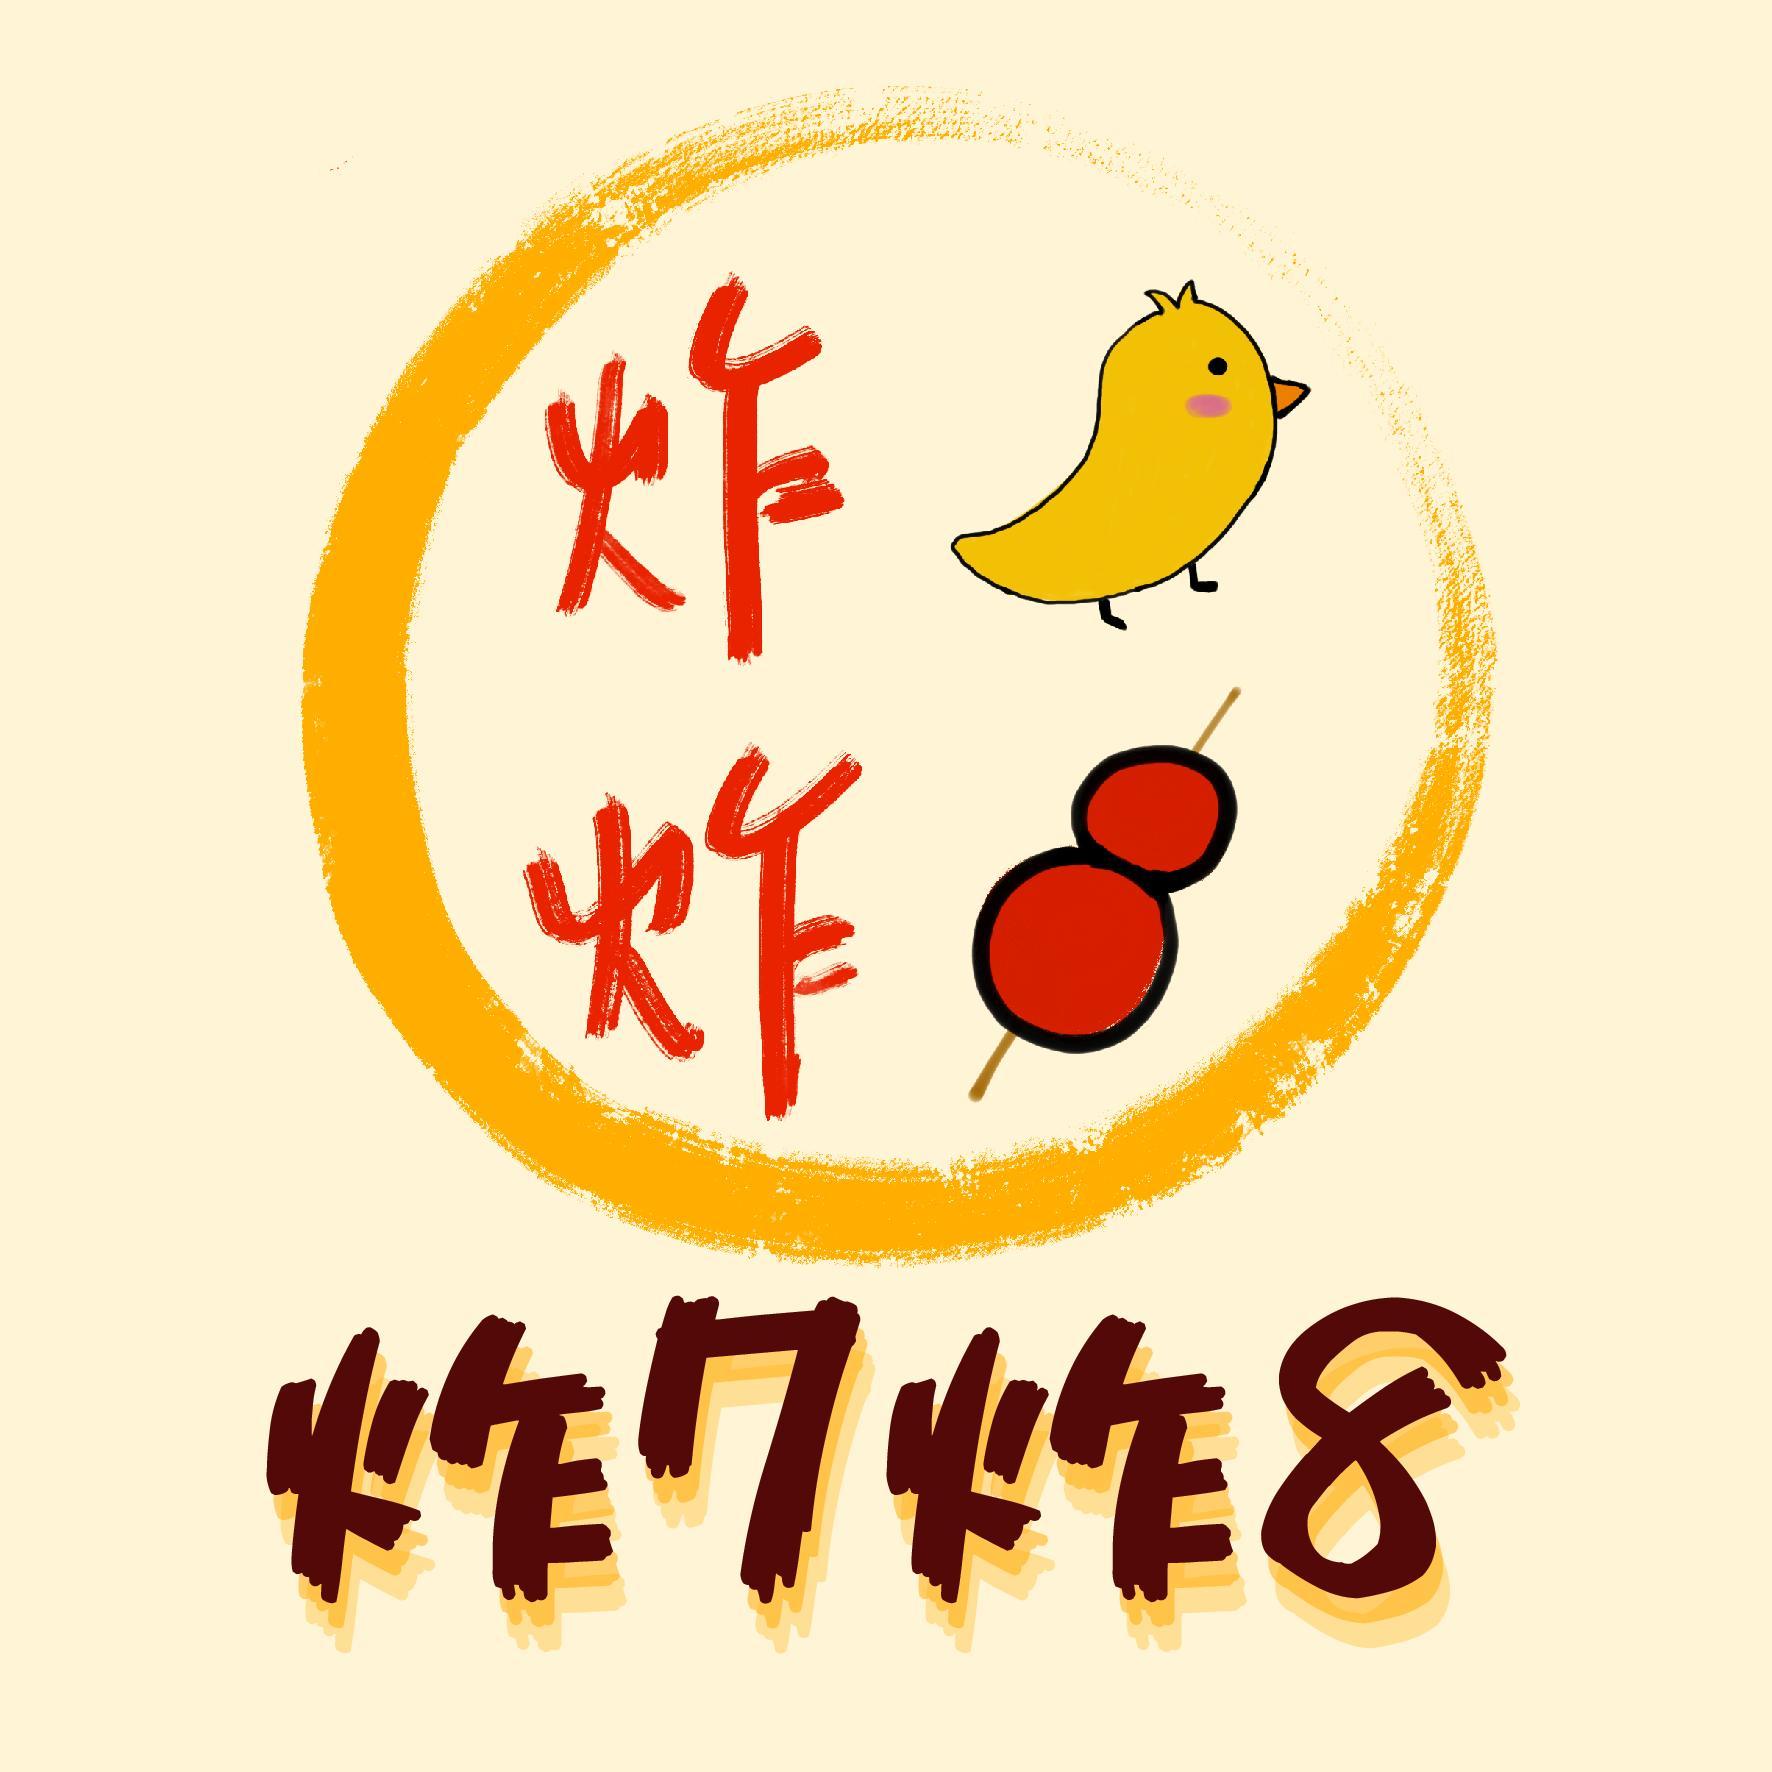 Crazy Fried Chicken logo